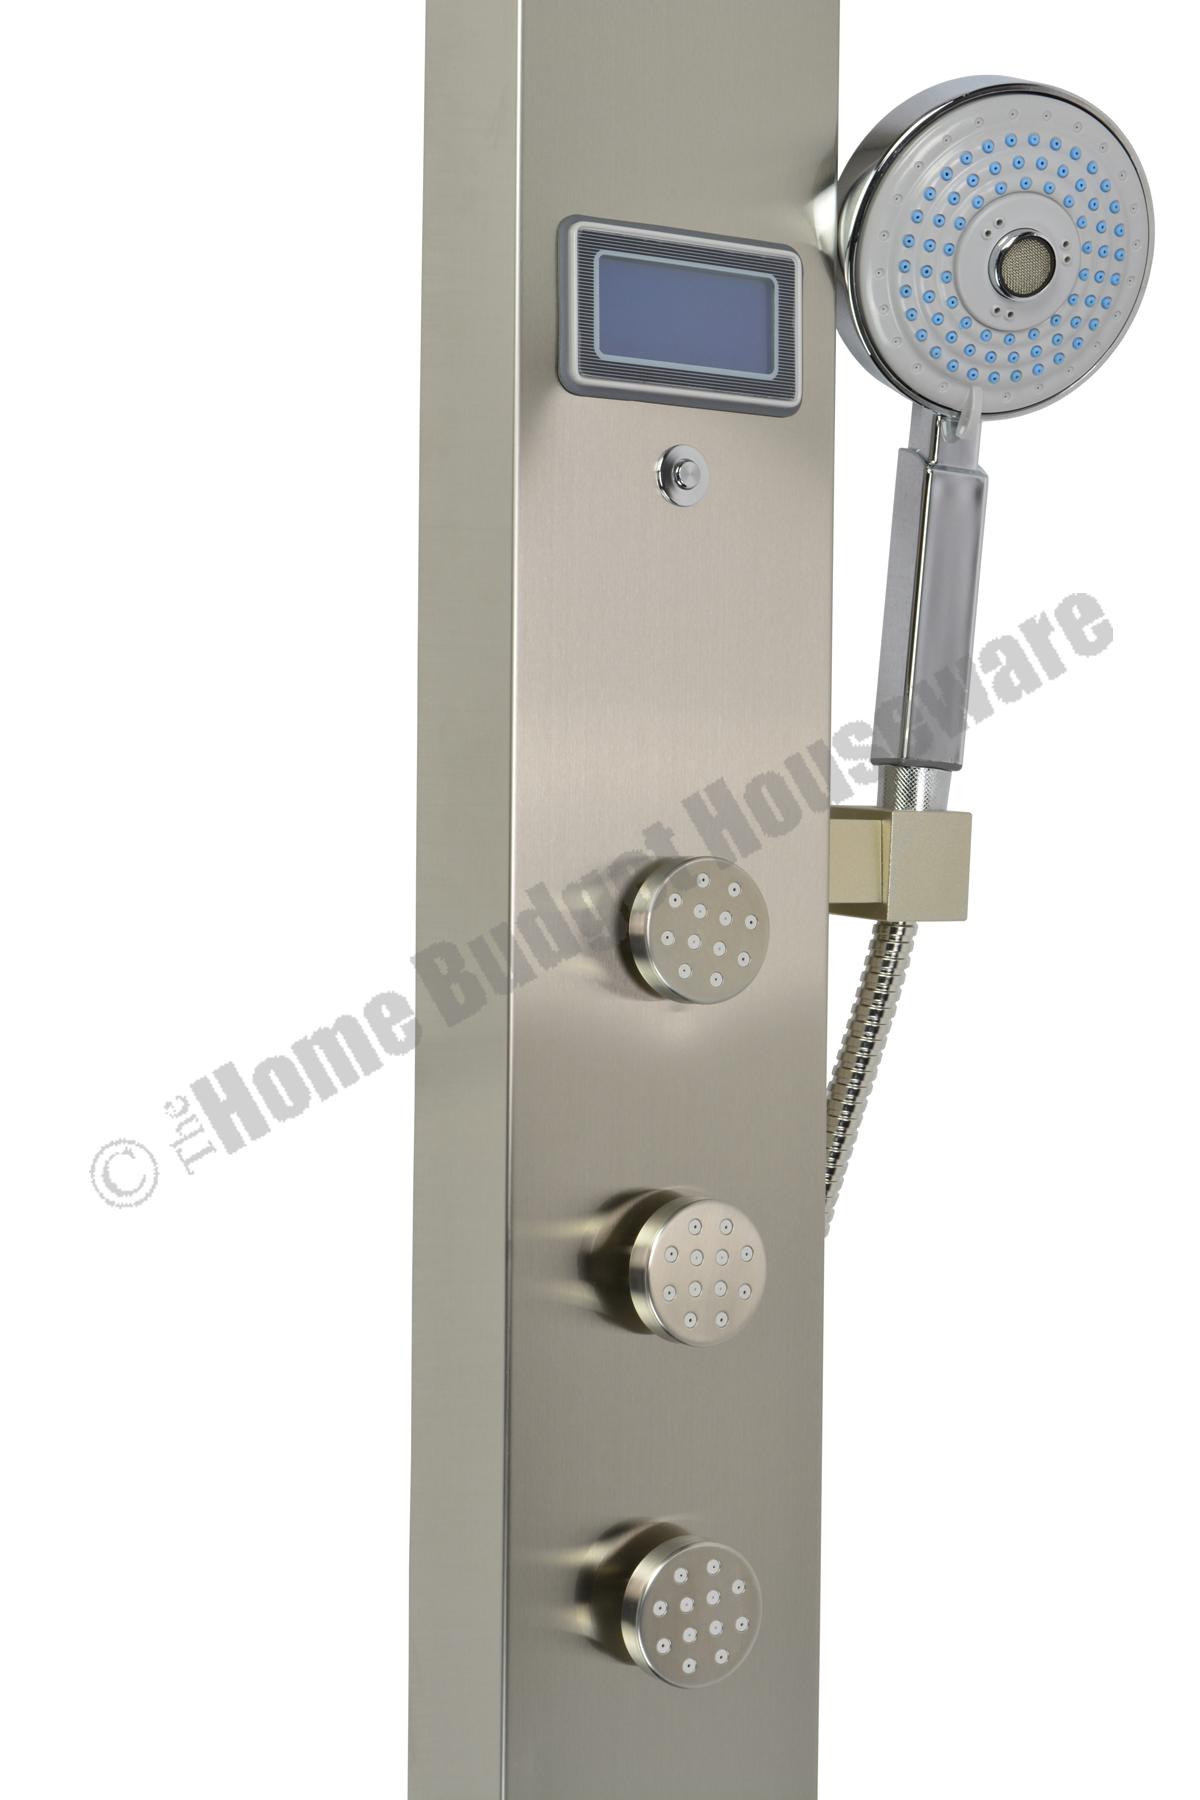 59 Bathroom Shower Panel With Rainfall Showerhead 3 Jets